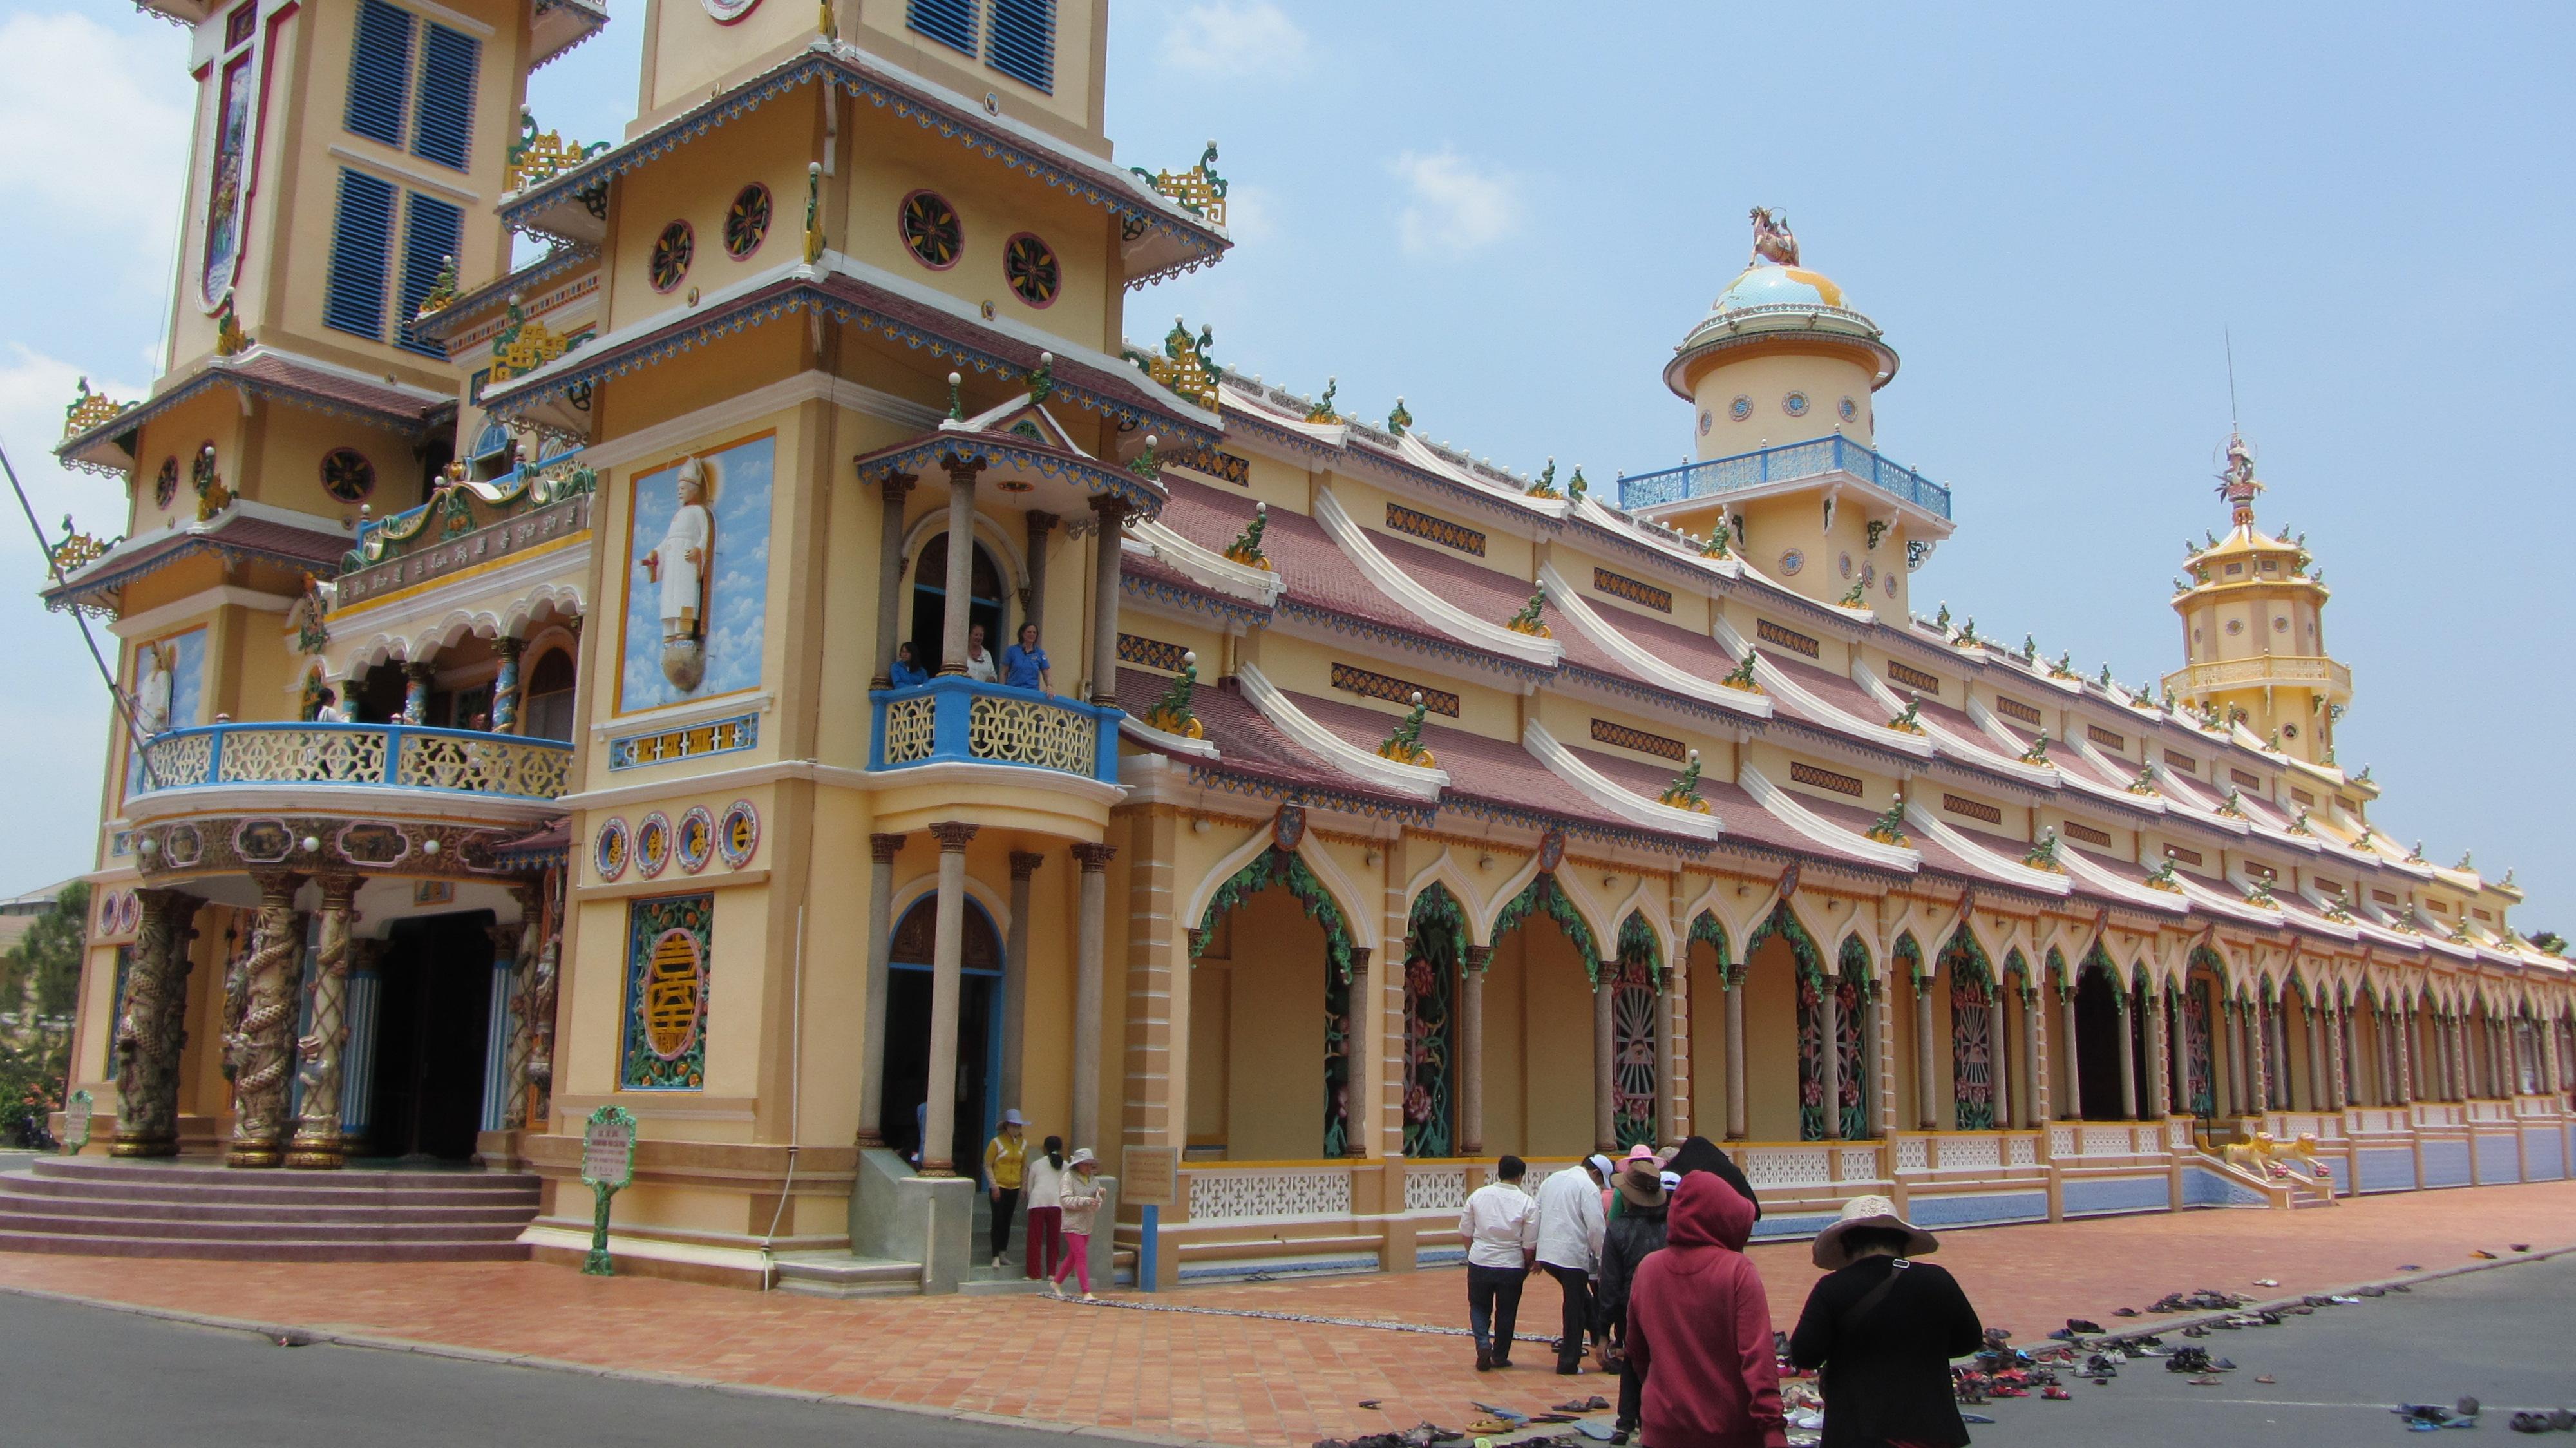 Tây Ninh Holy See